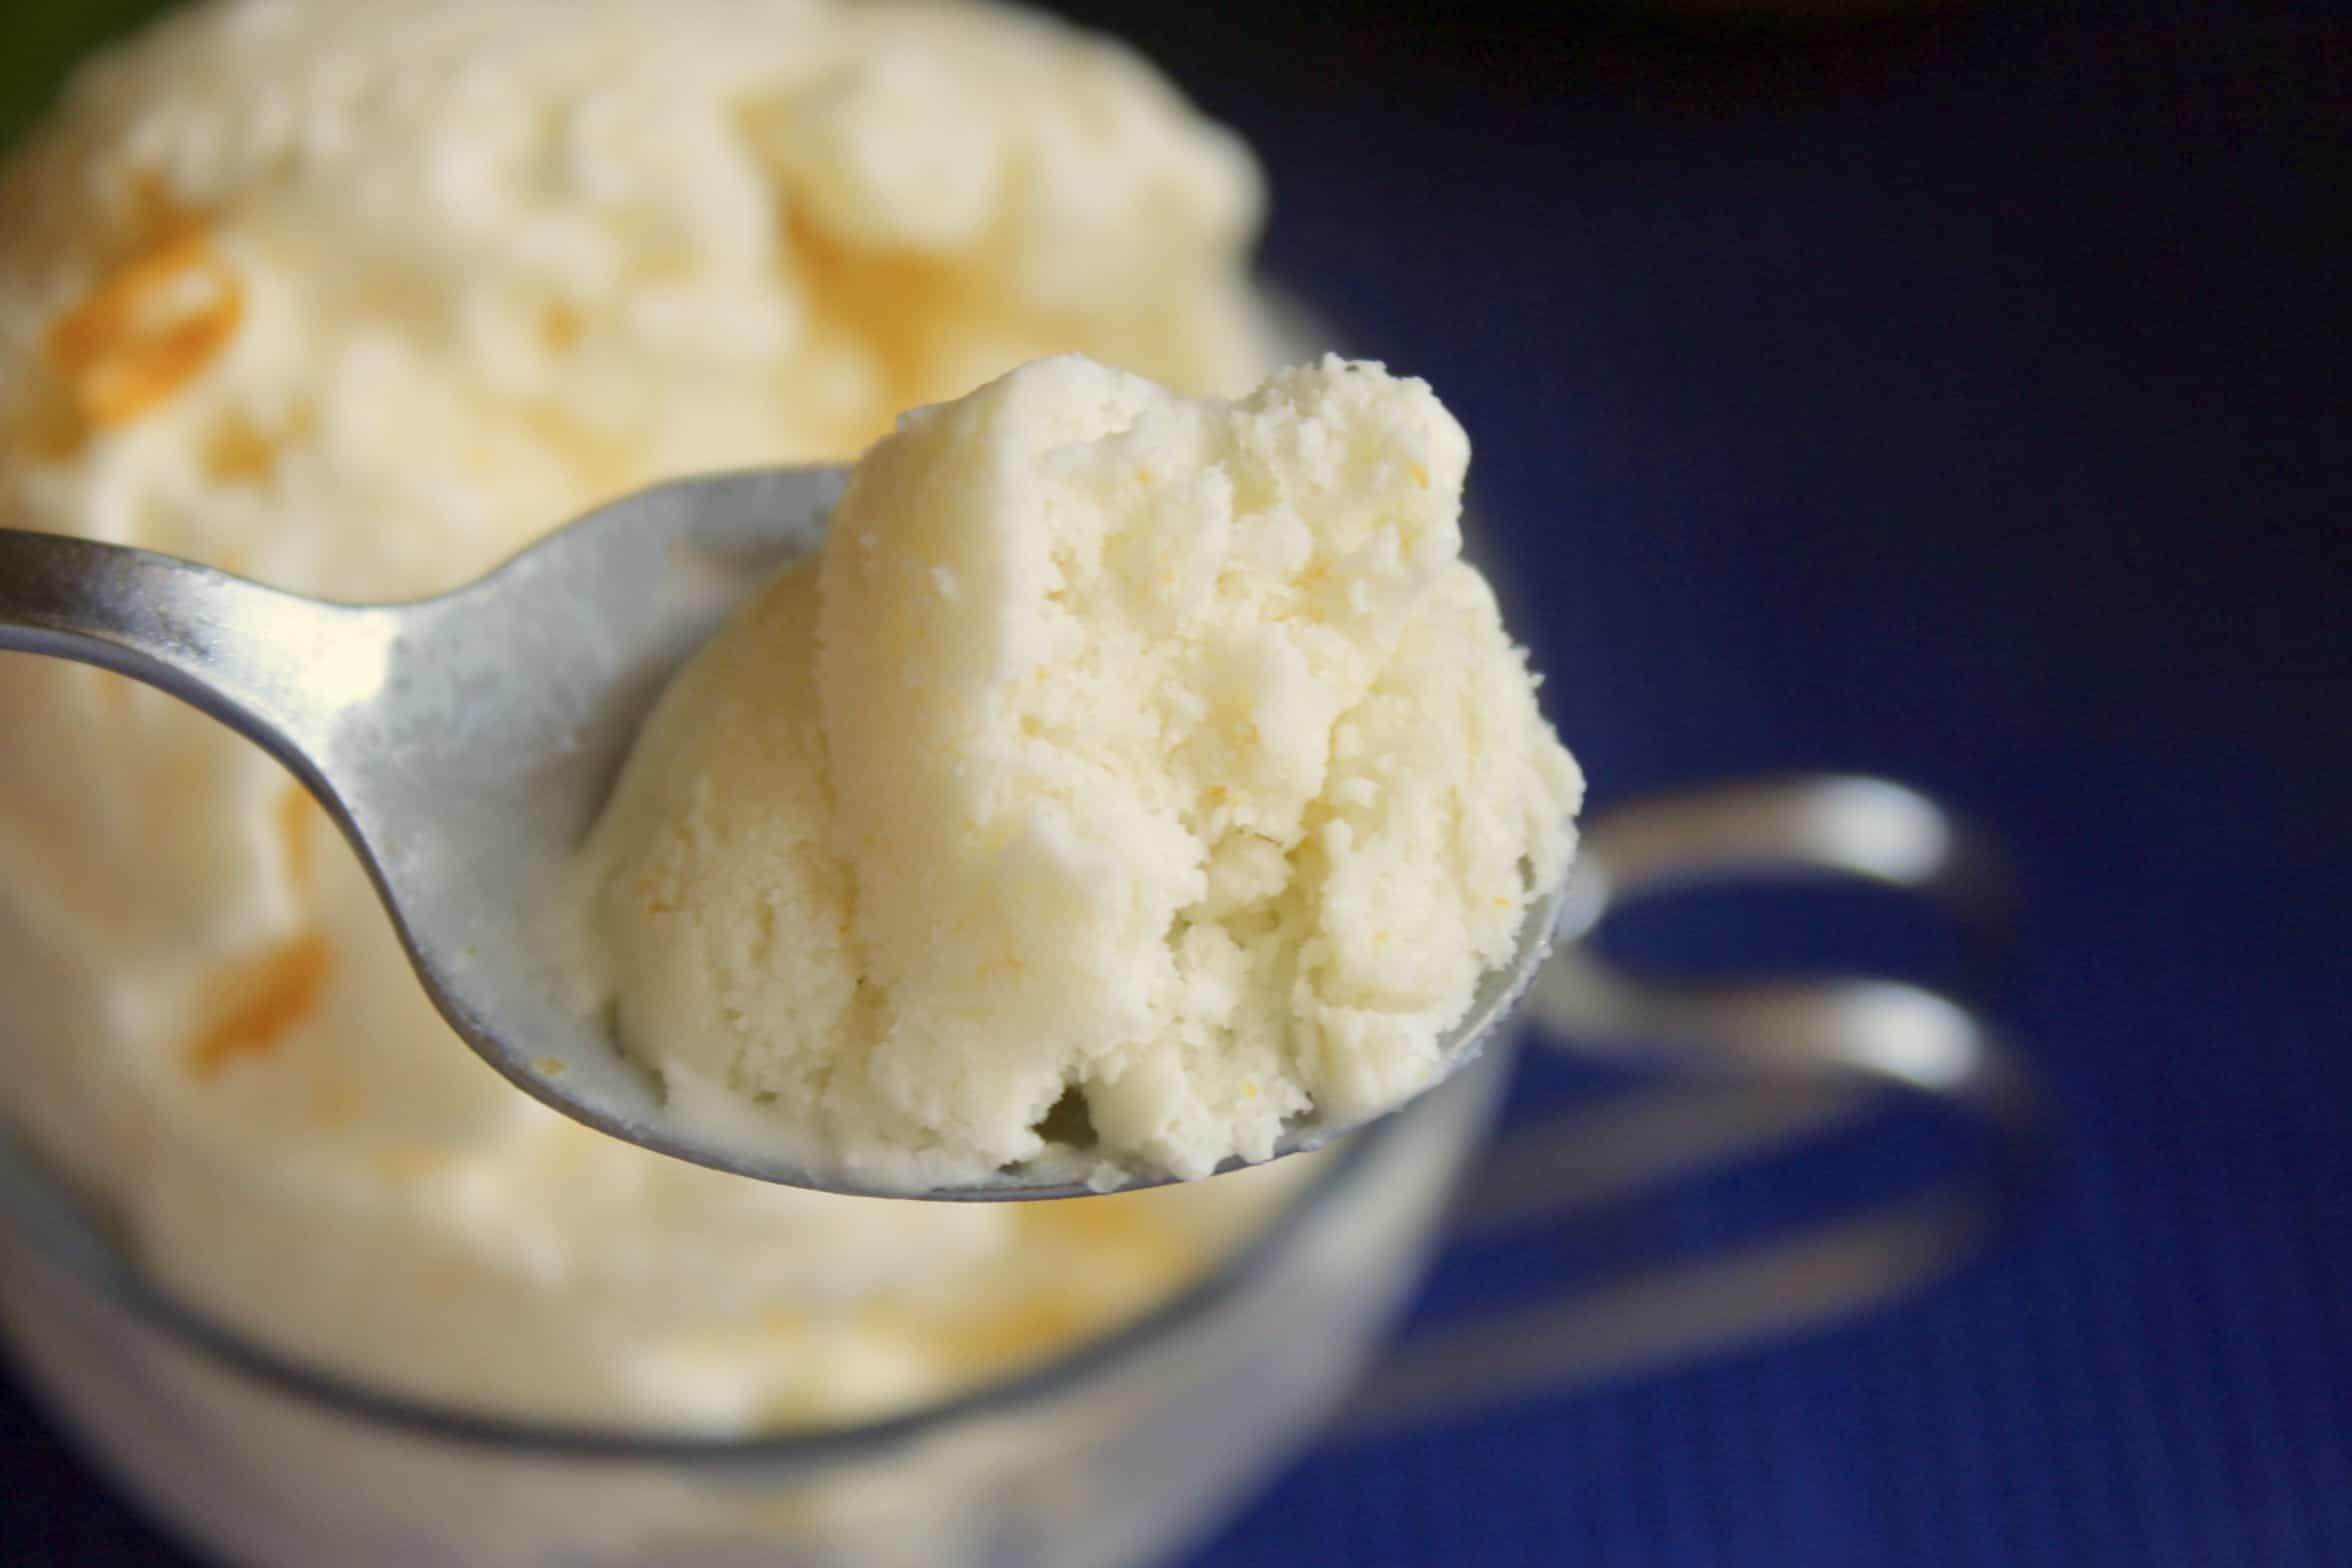 spoonful of lemon ice cream